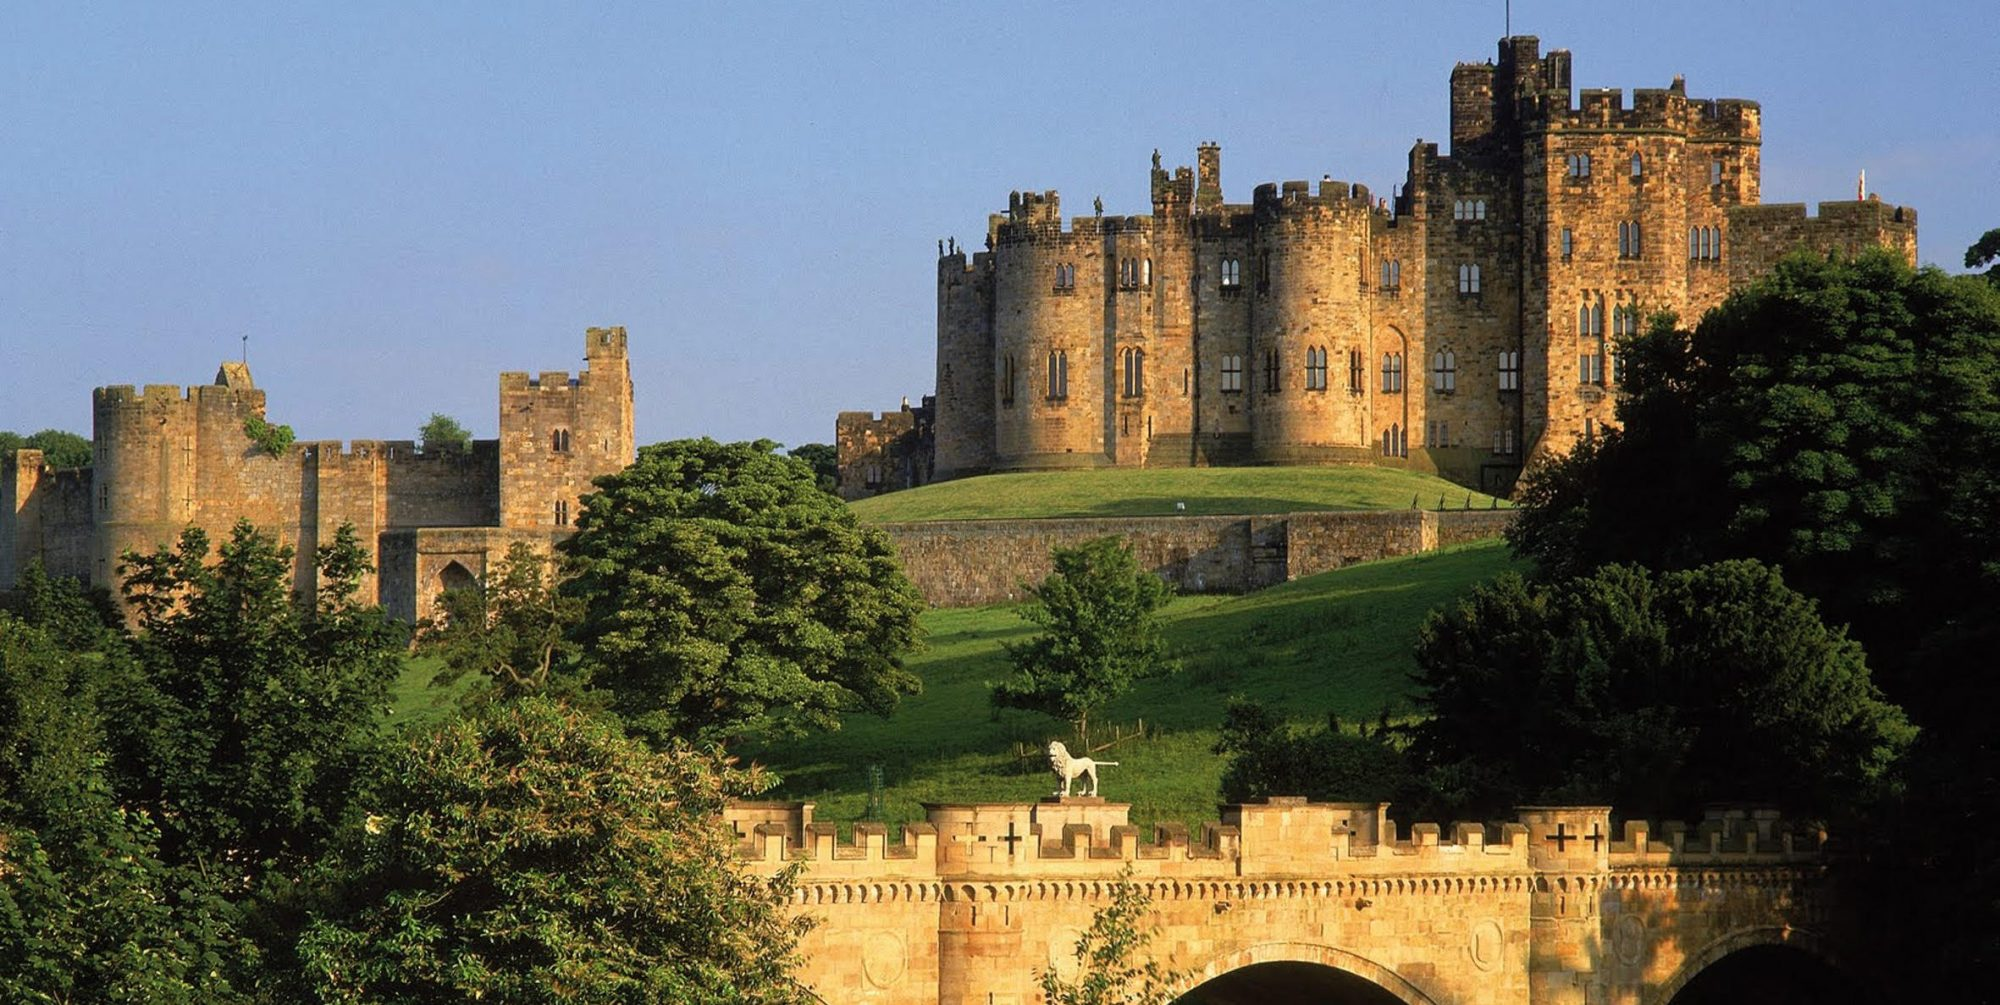 Alnwick Castle With Bridge Aspect Ratio X